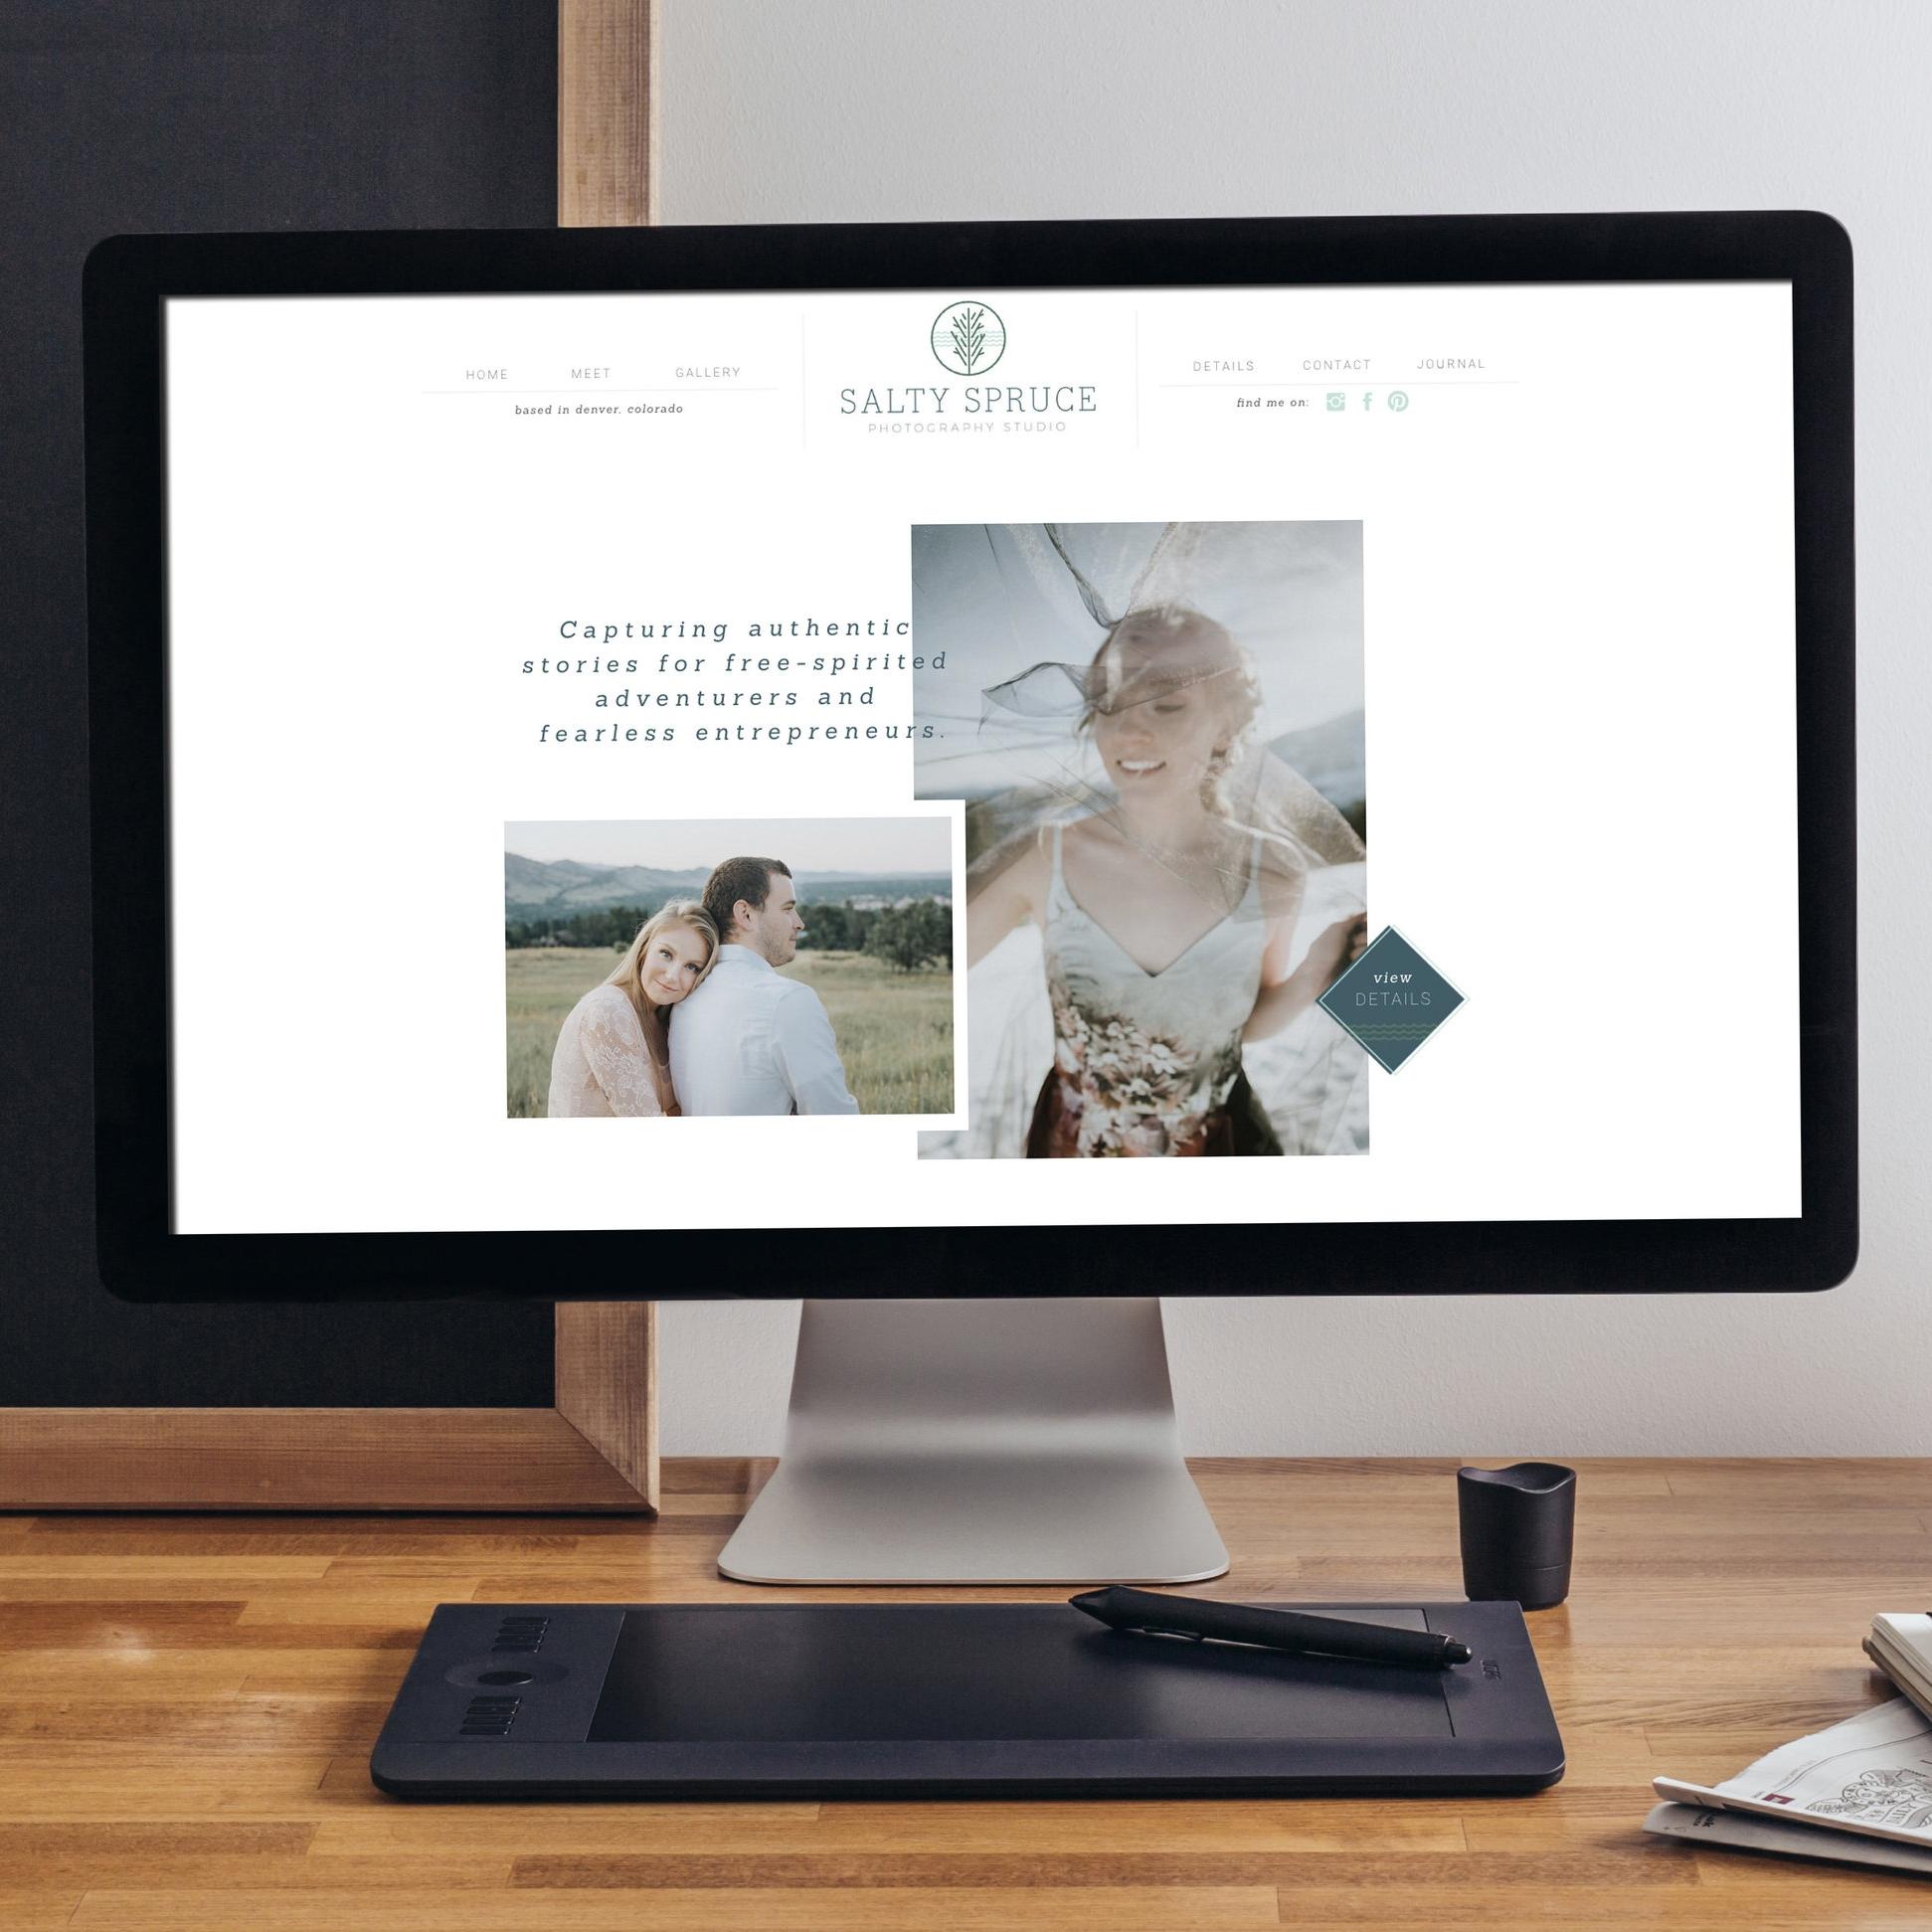 Salty Spruce Rebrand and Website Design